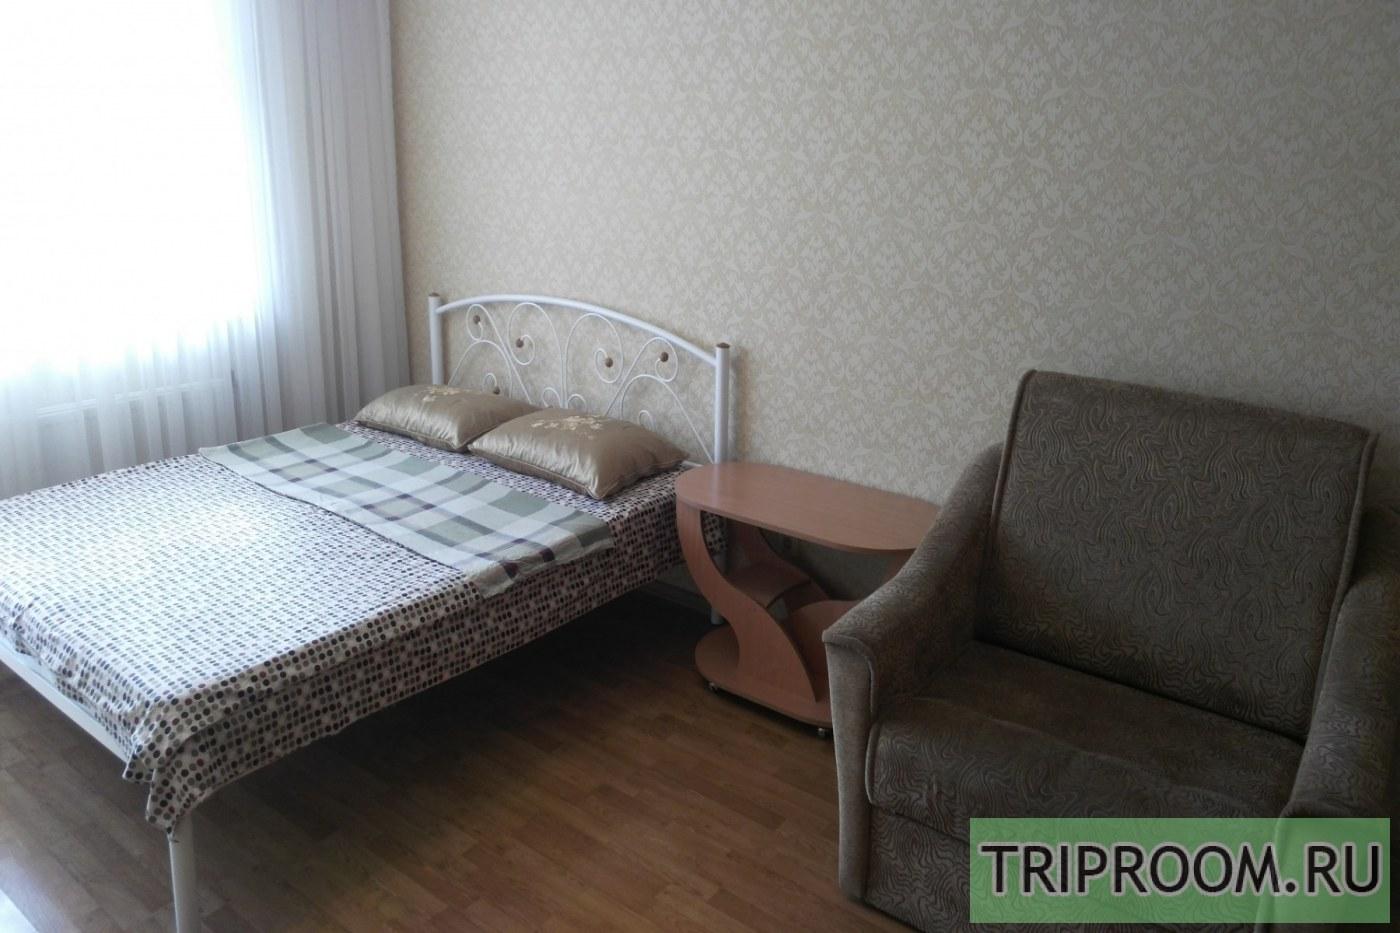 1-комнатная квартира посуточно (вариант № 38995), ул. Лексина улица, фото № 4